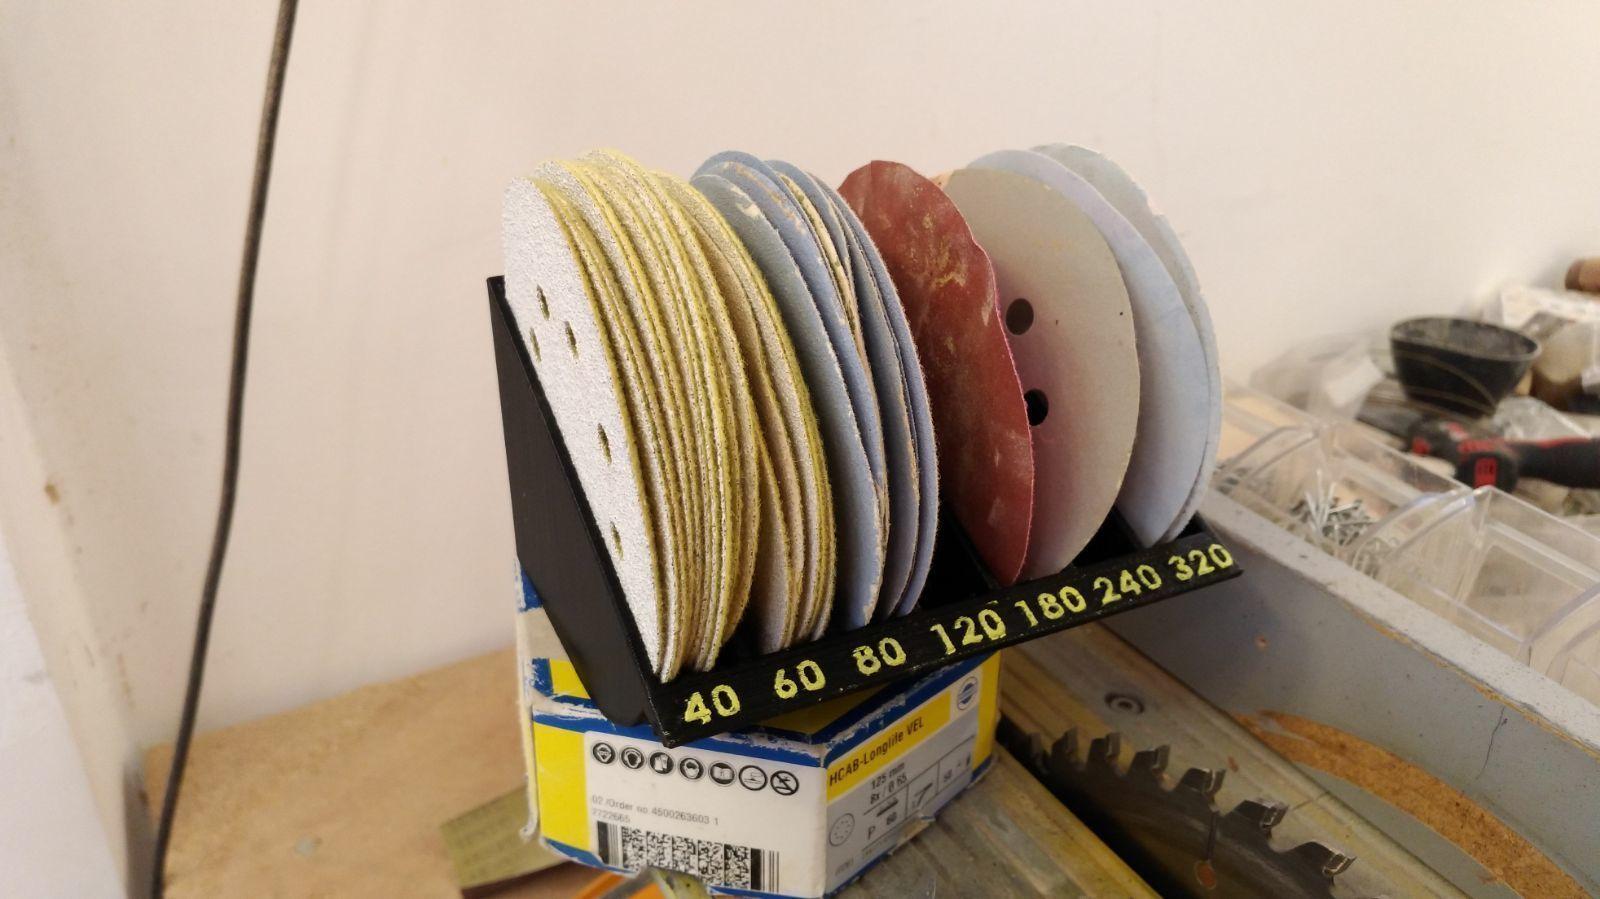 ... Sanding Discs Rack  Organizer   5 Inch Disks 3d Model Stl 2